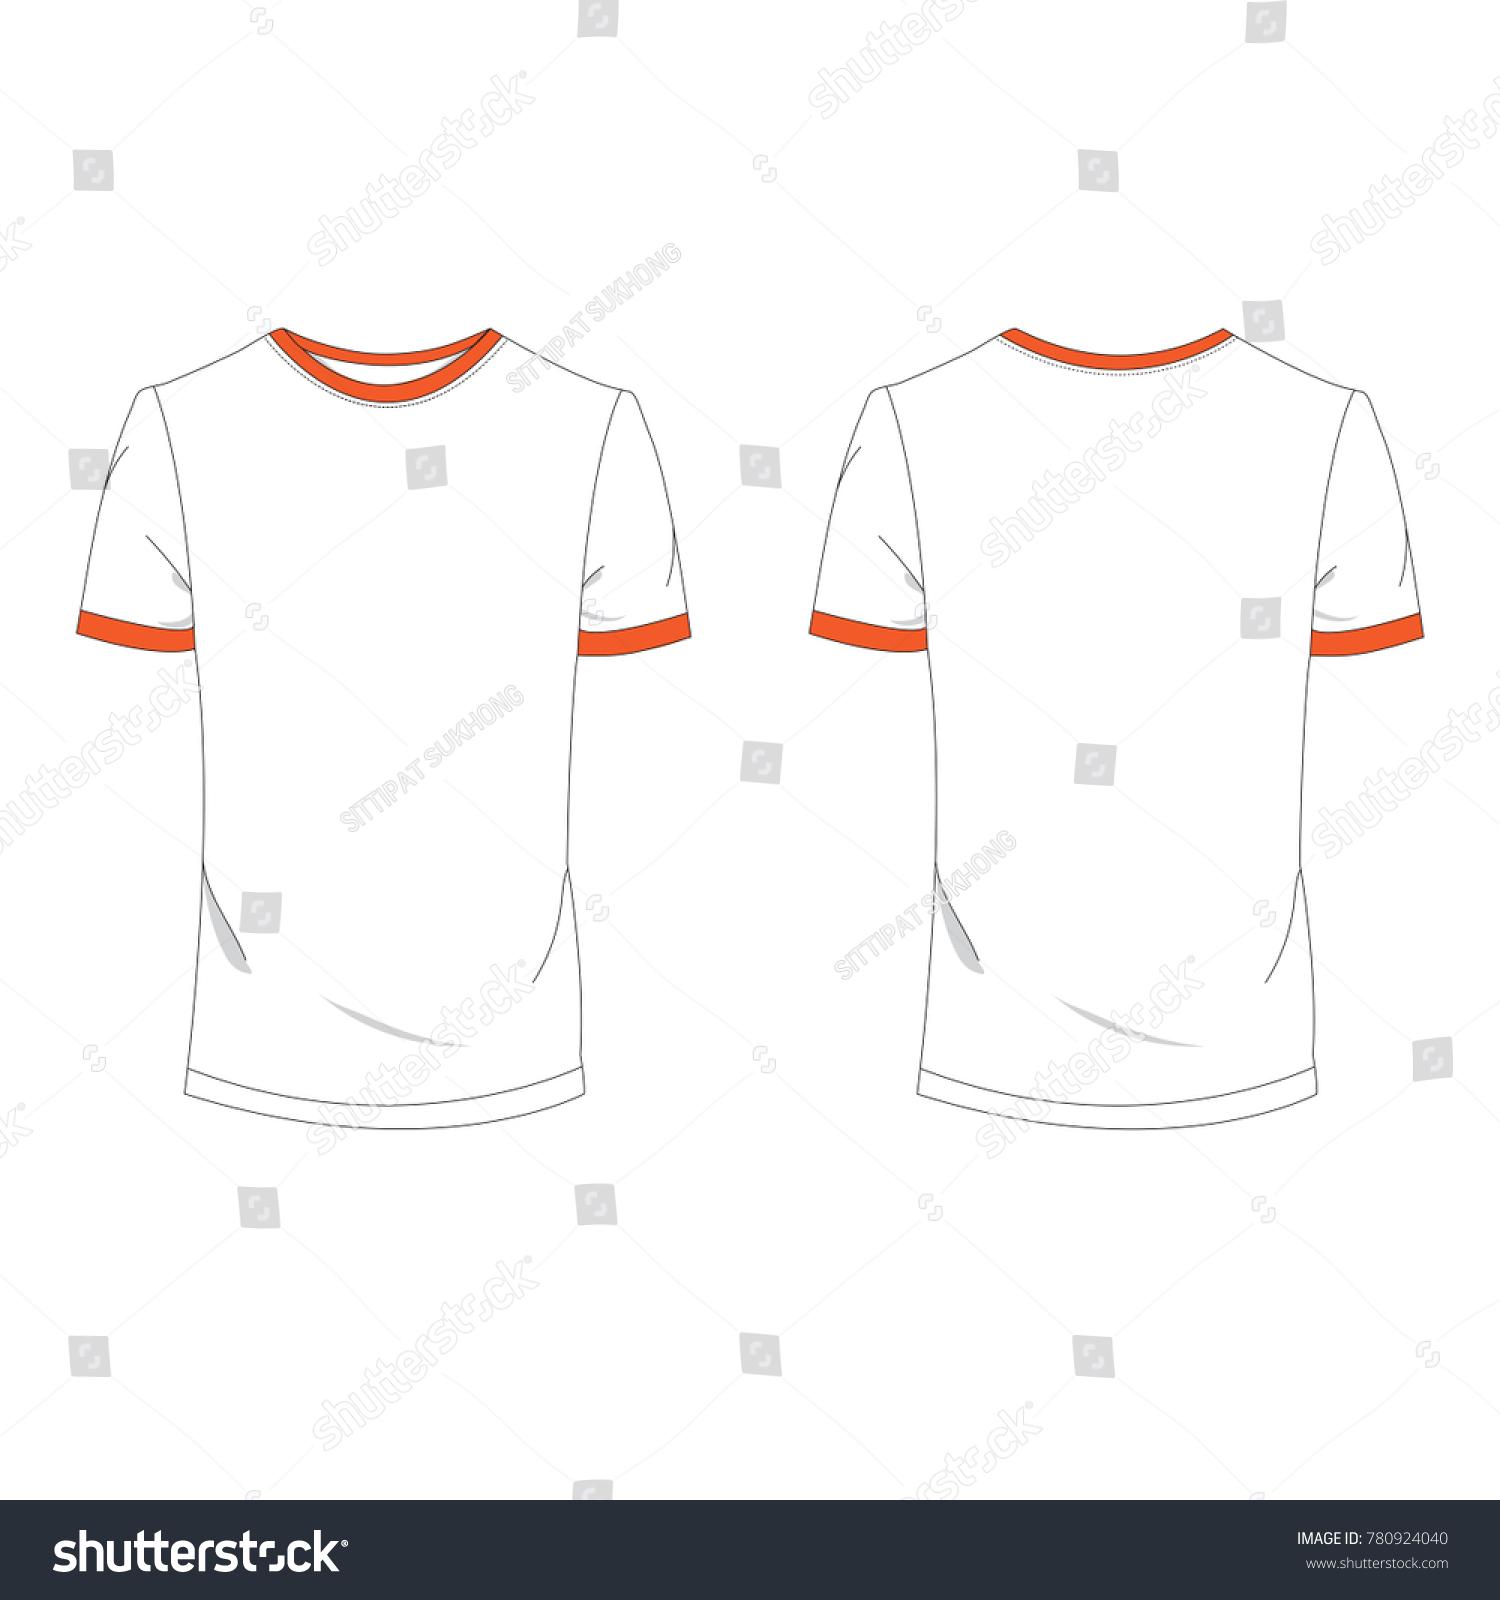 Twotone Orange White Tshirt Template Using Stock Vector Royalty